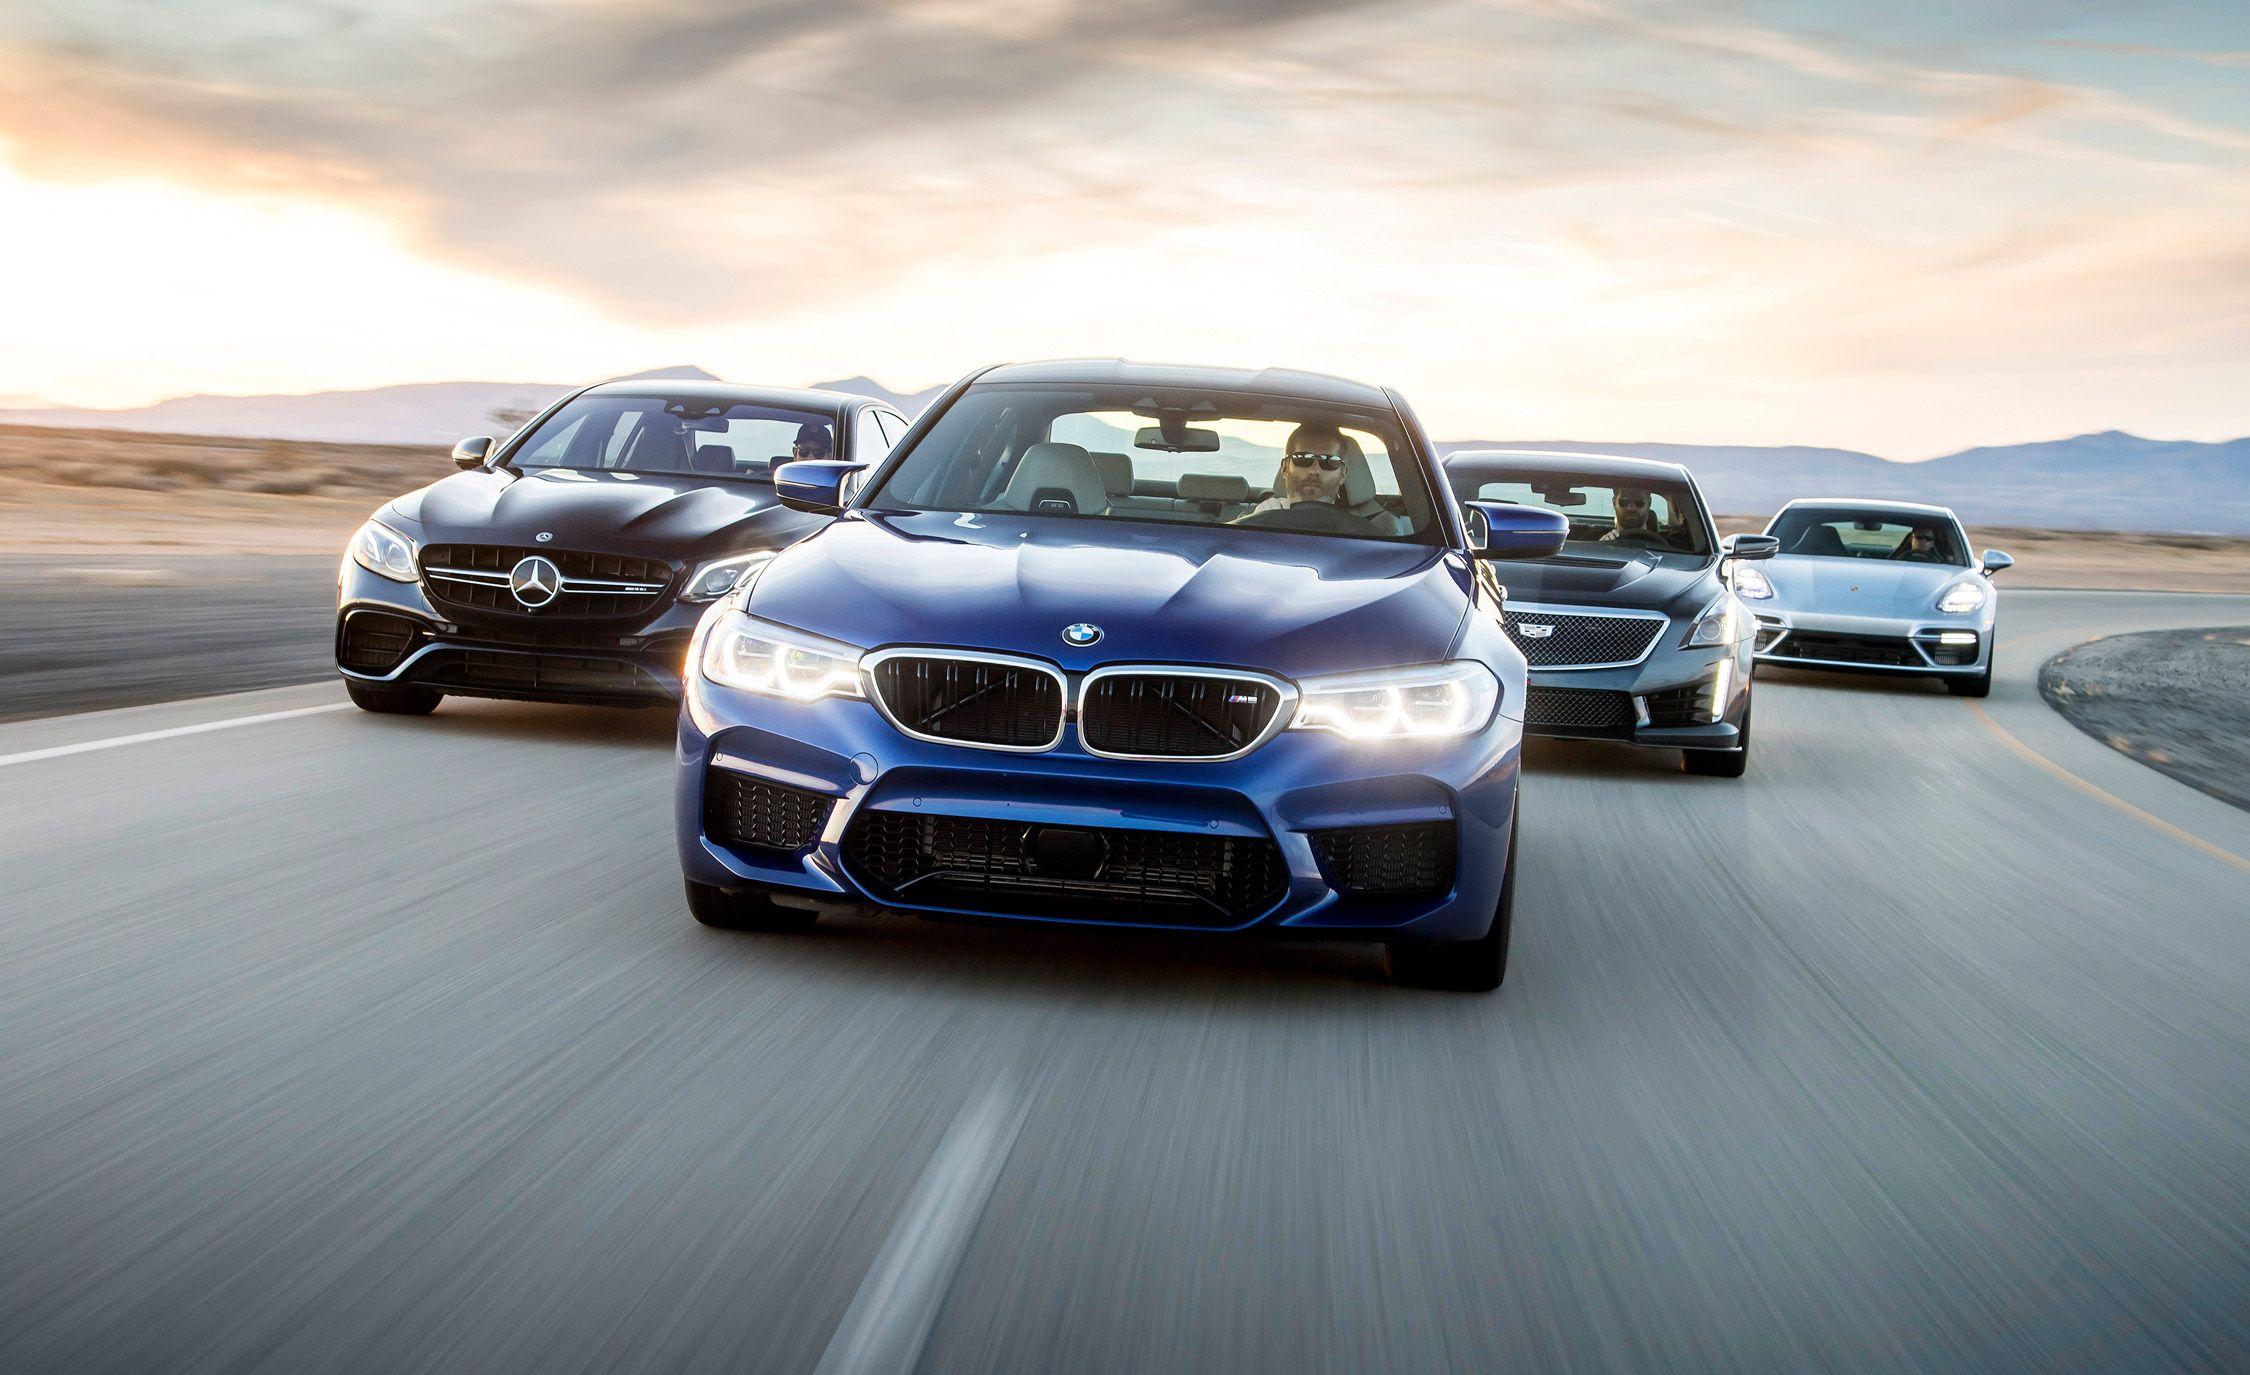 2018 BMW M5 vs. Cadillac CTS-V, Mercedes-AMG E63 S, Porsche Panamera Turbo